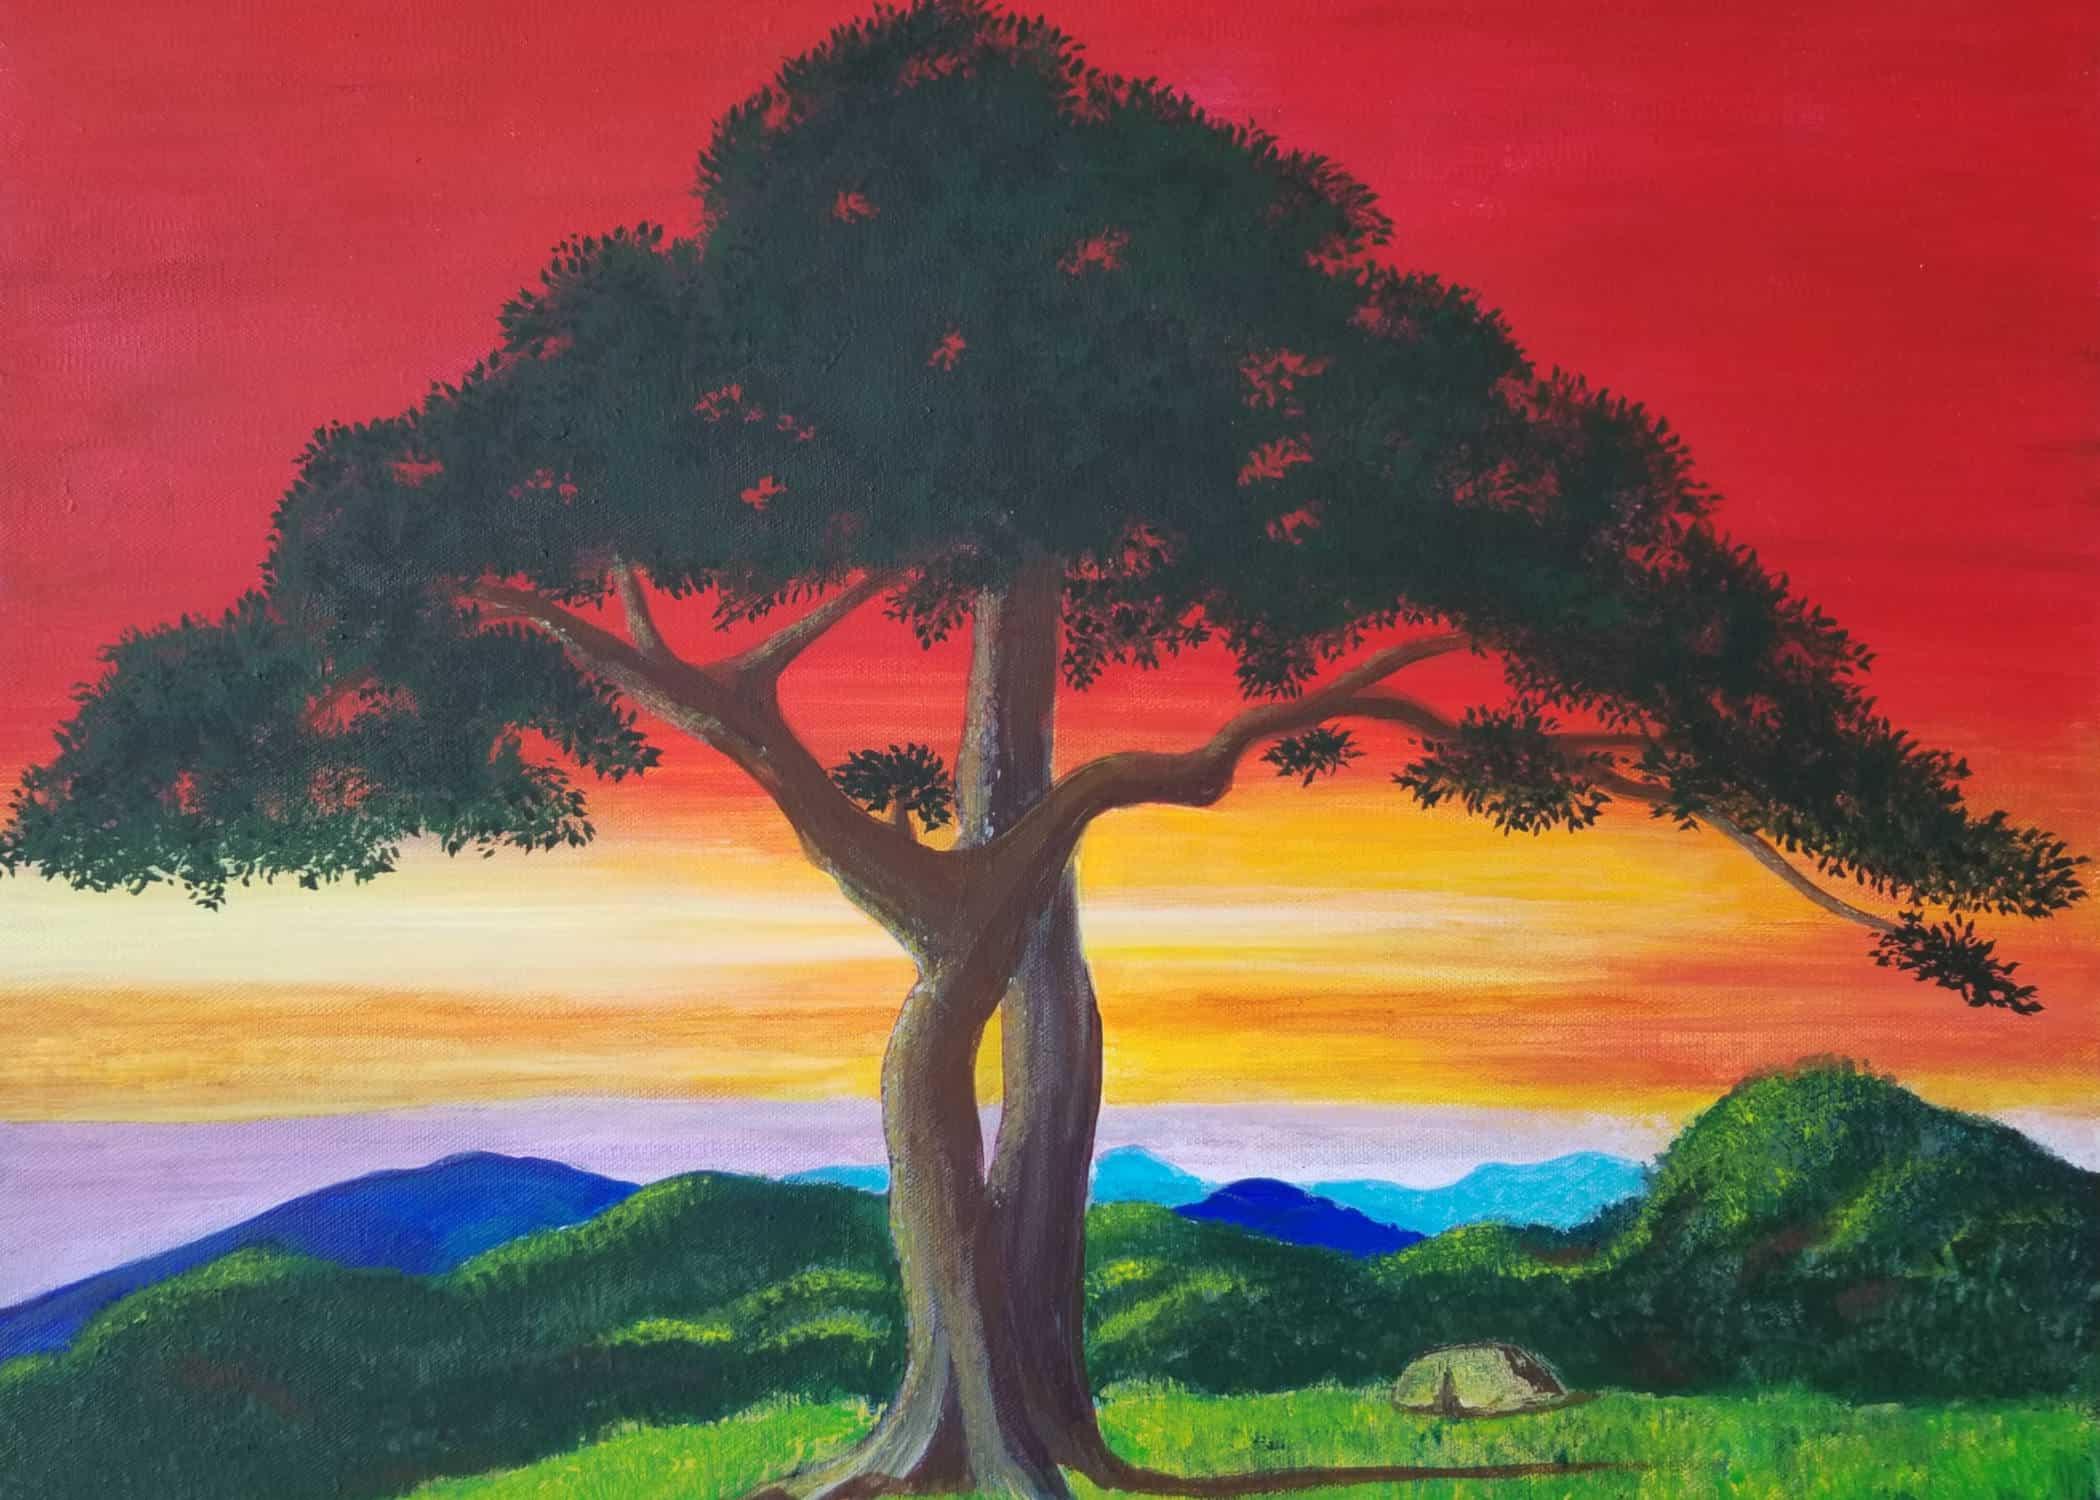 White oak against sunrise sky on Skyline Drive, Virginia